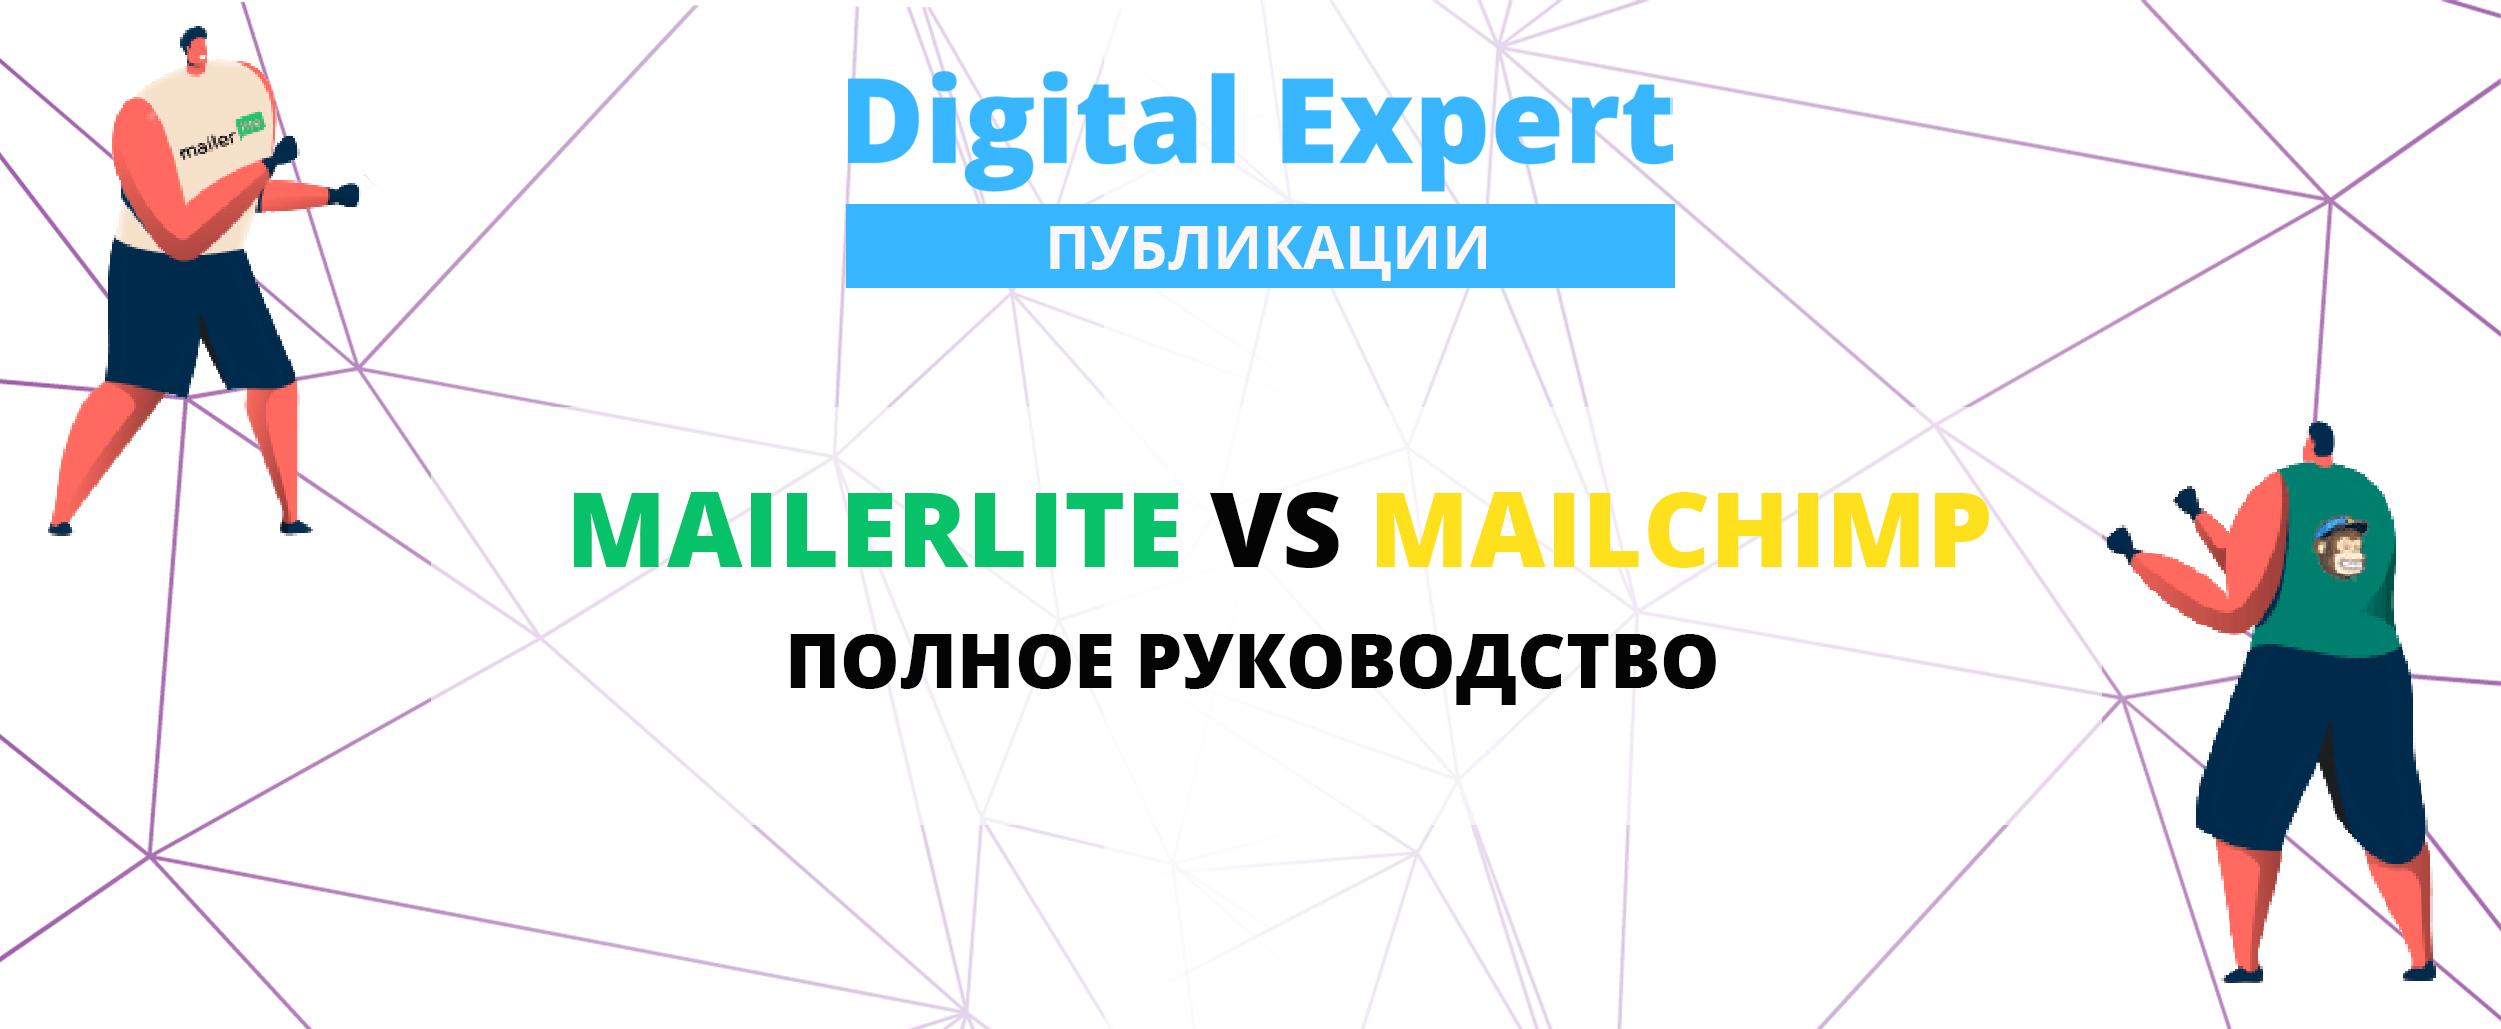 Mailerlite or Mailchimp - сравнение лучших email-рассылок